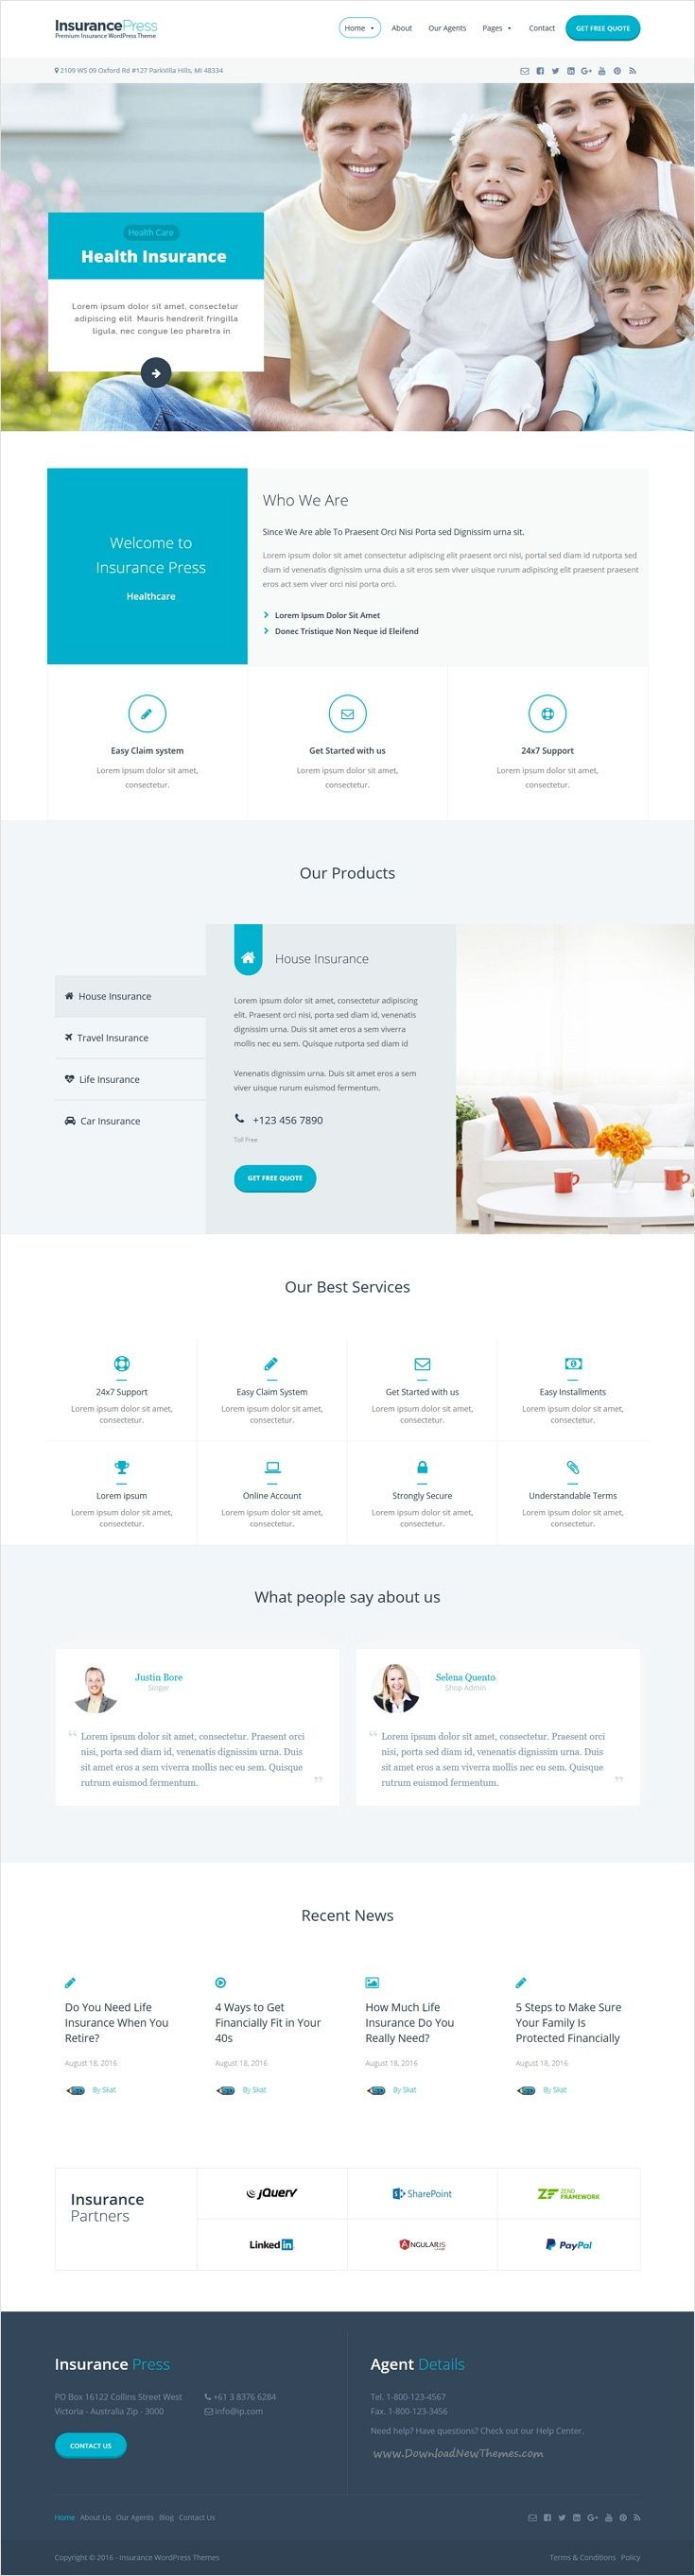 Insurance Agency Wordpress Theme Magazine Theme Wordpress